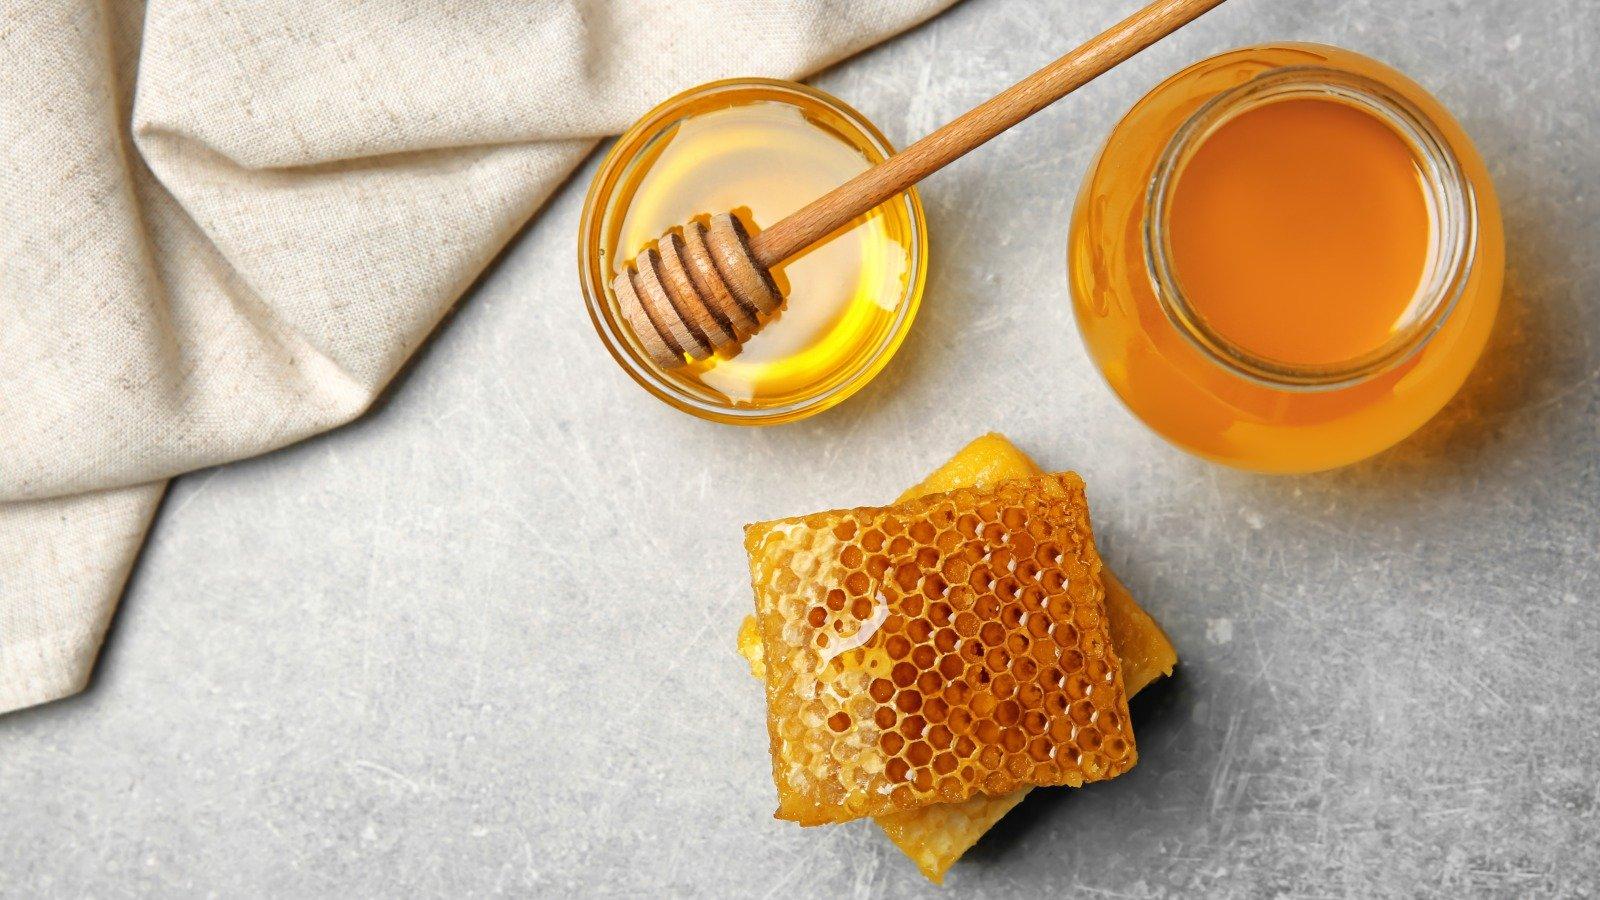 Benefits Of Honey You'll Wish You Knew Sooner